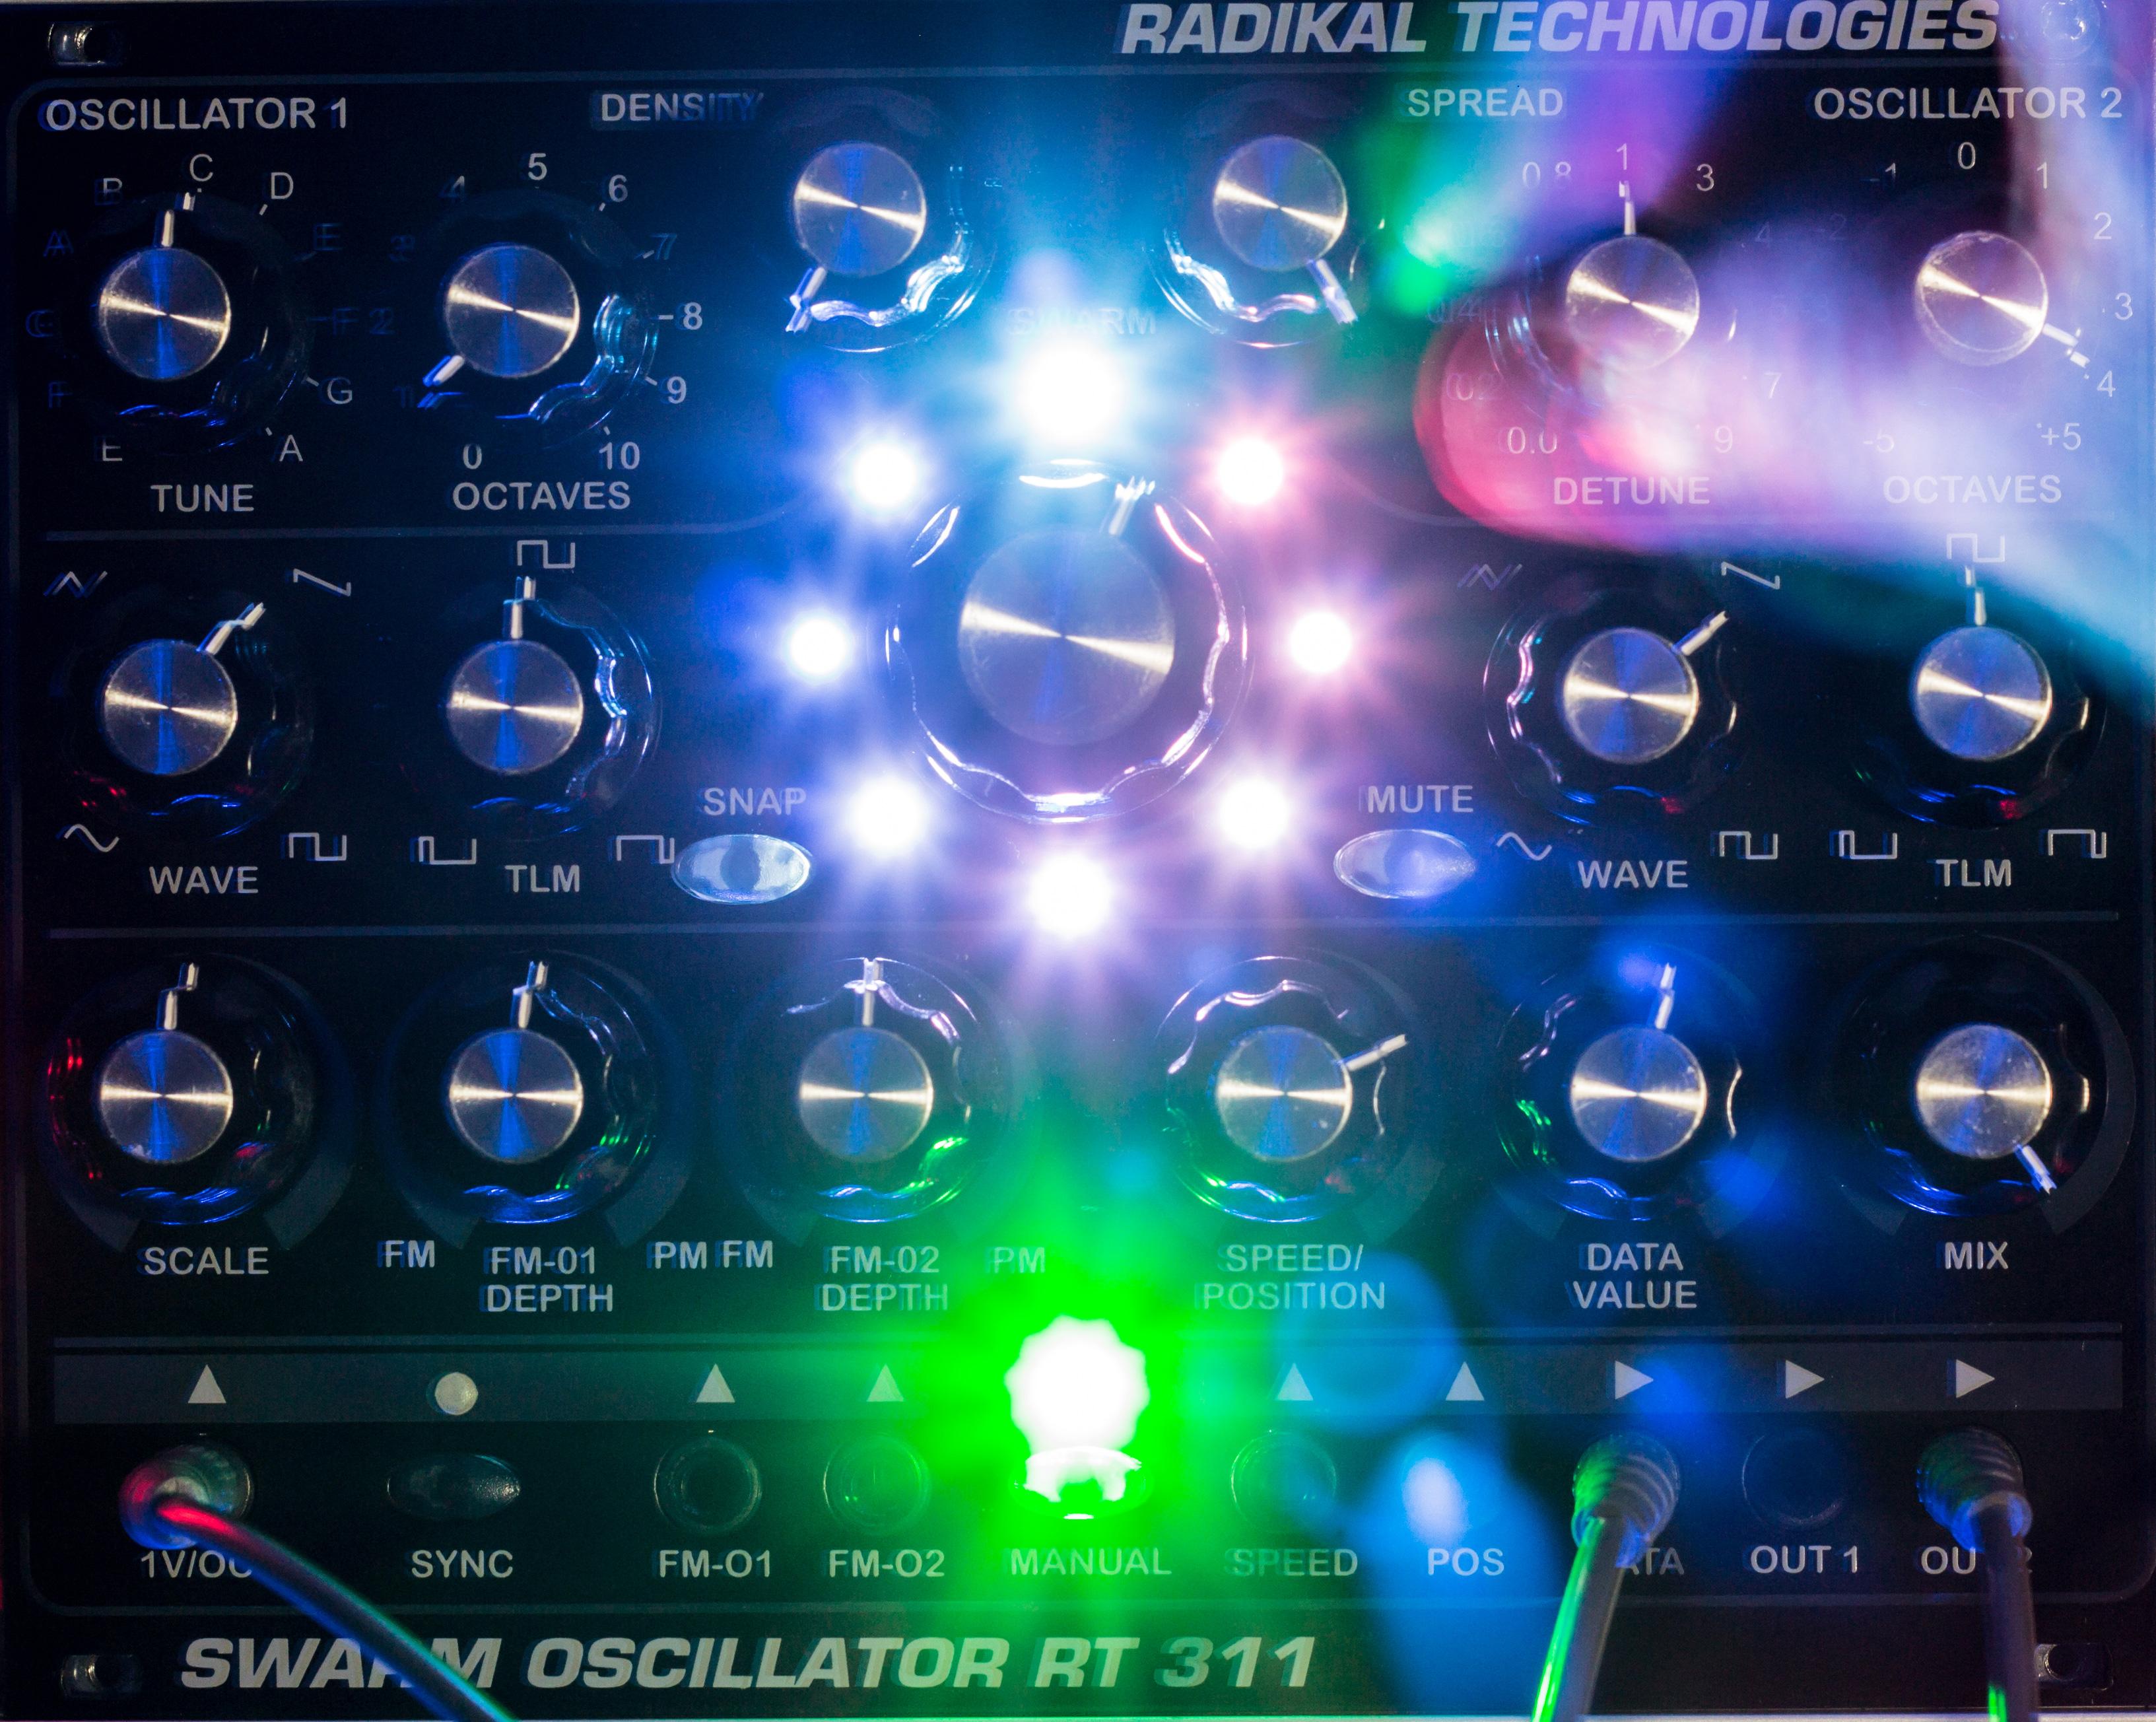 Radikal Technologies RT-311 Swarm Oscillator on LSD